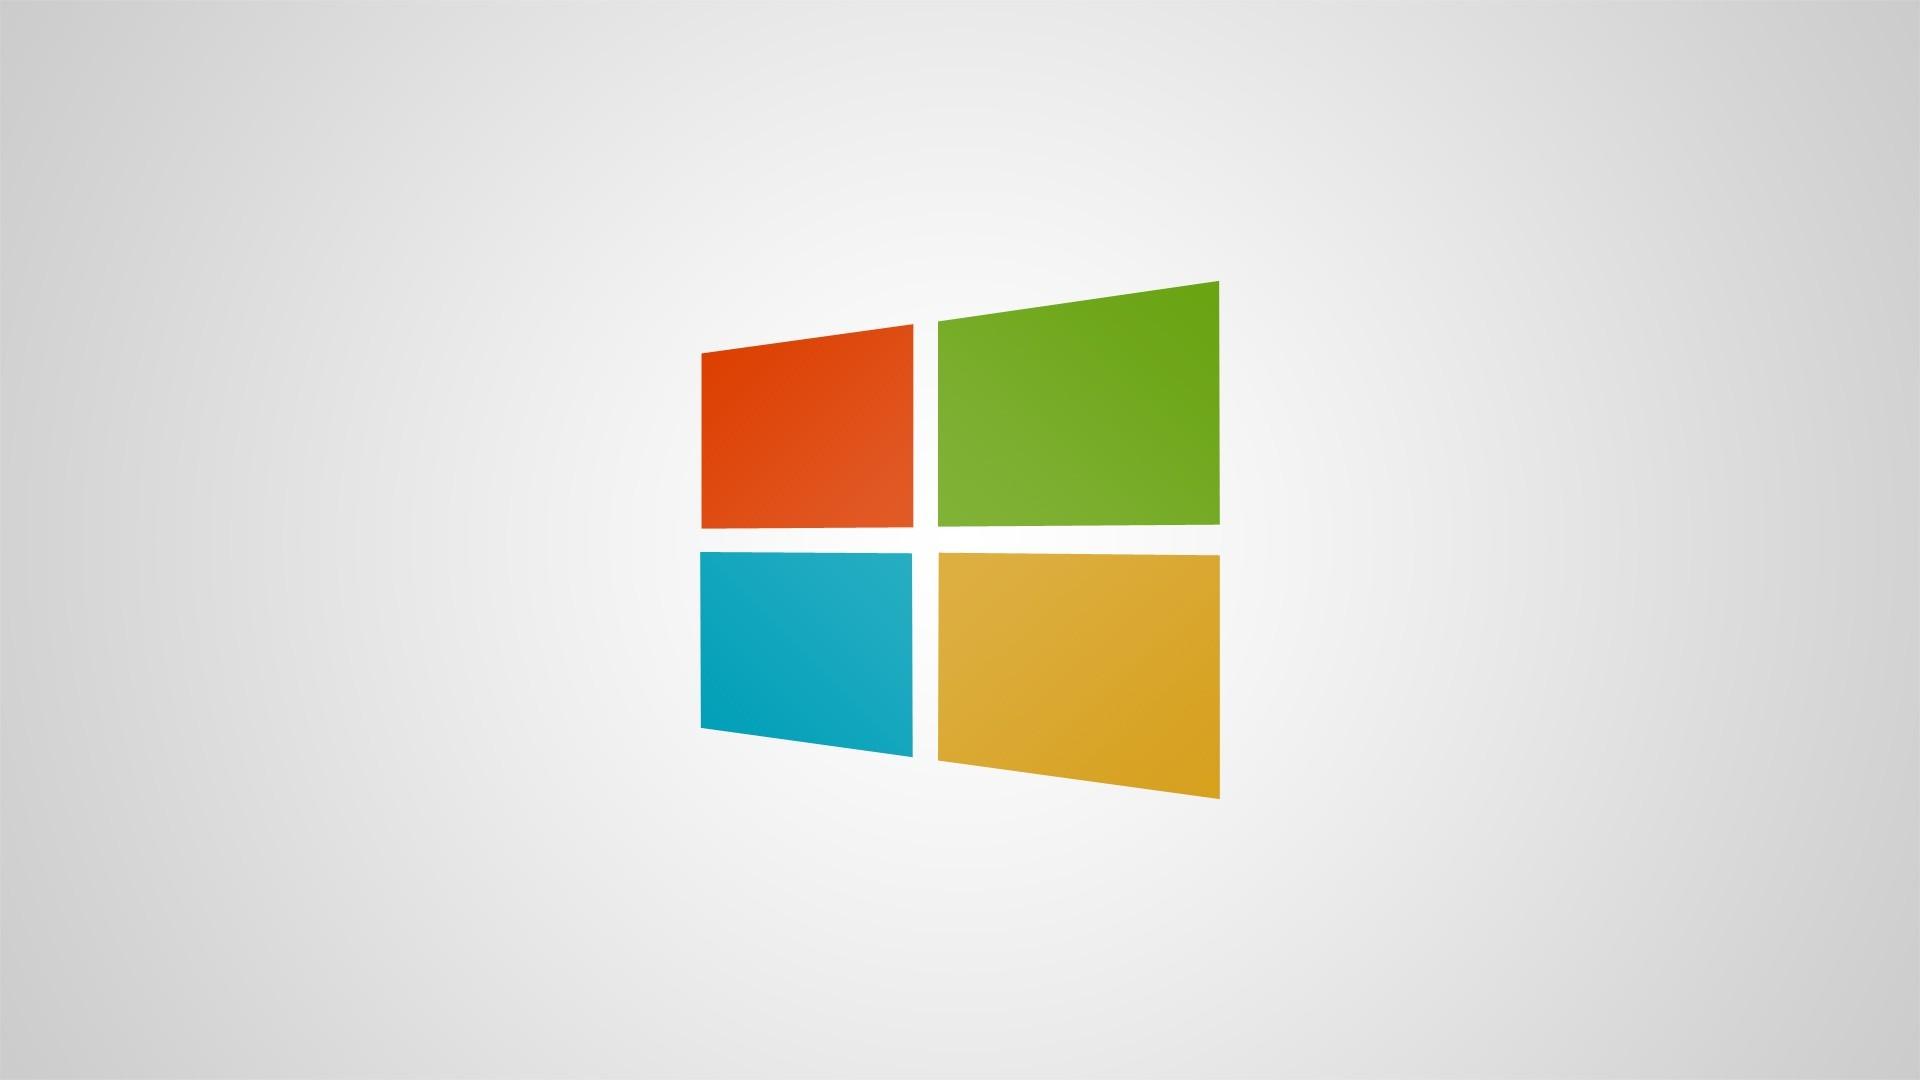 Microsoft Wallpaper 10